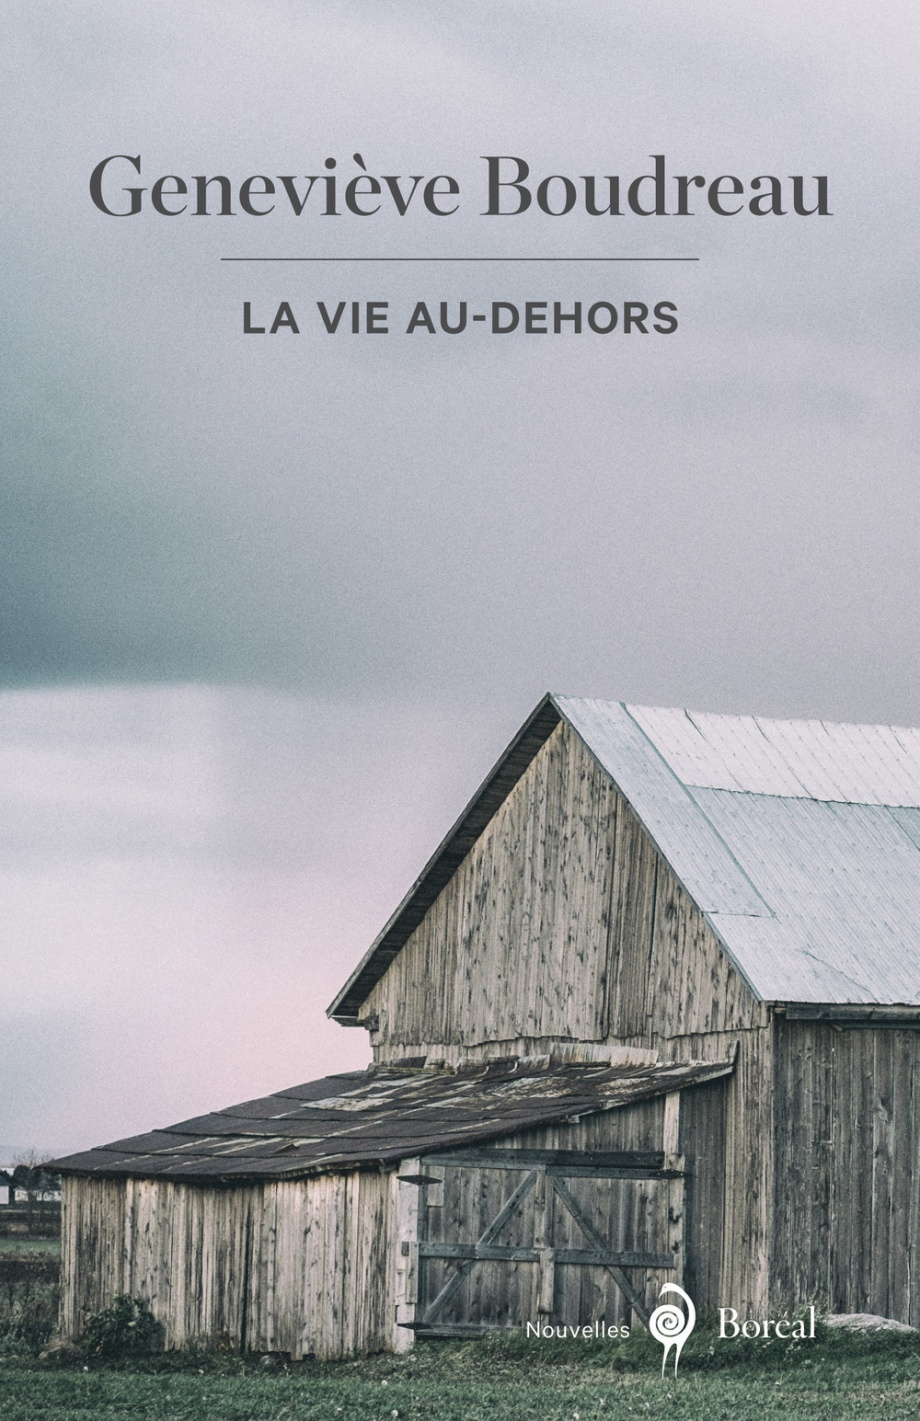 Geneviève_Boudreau